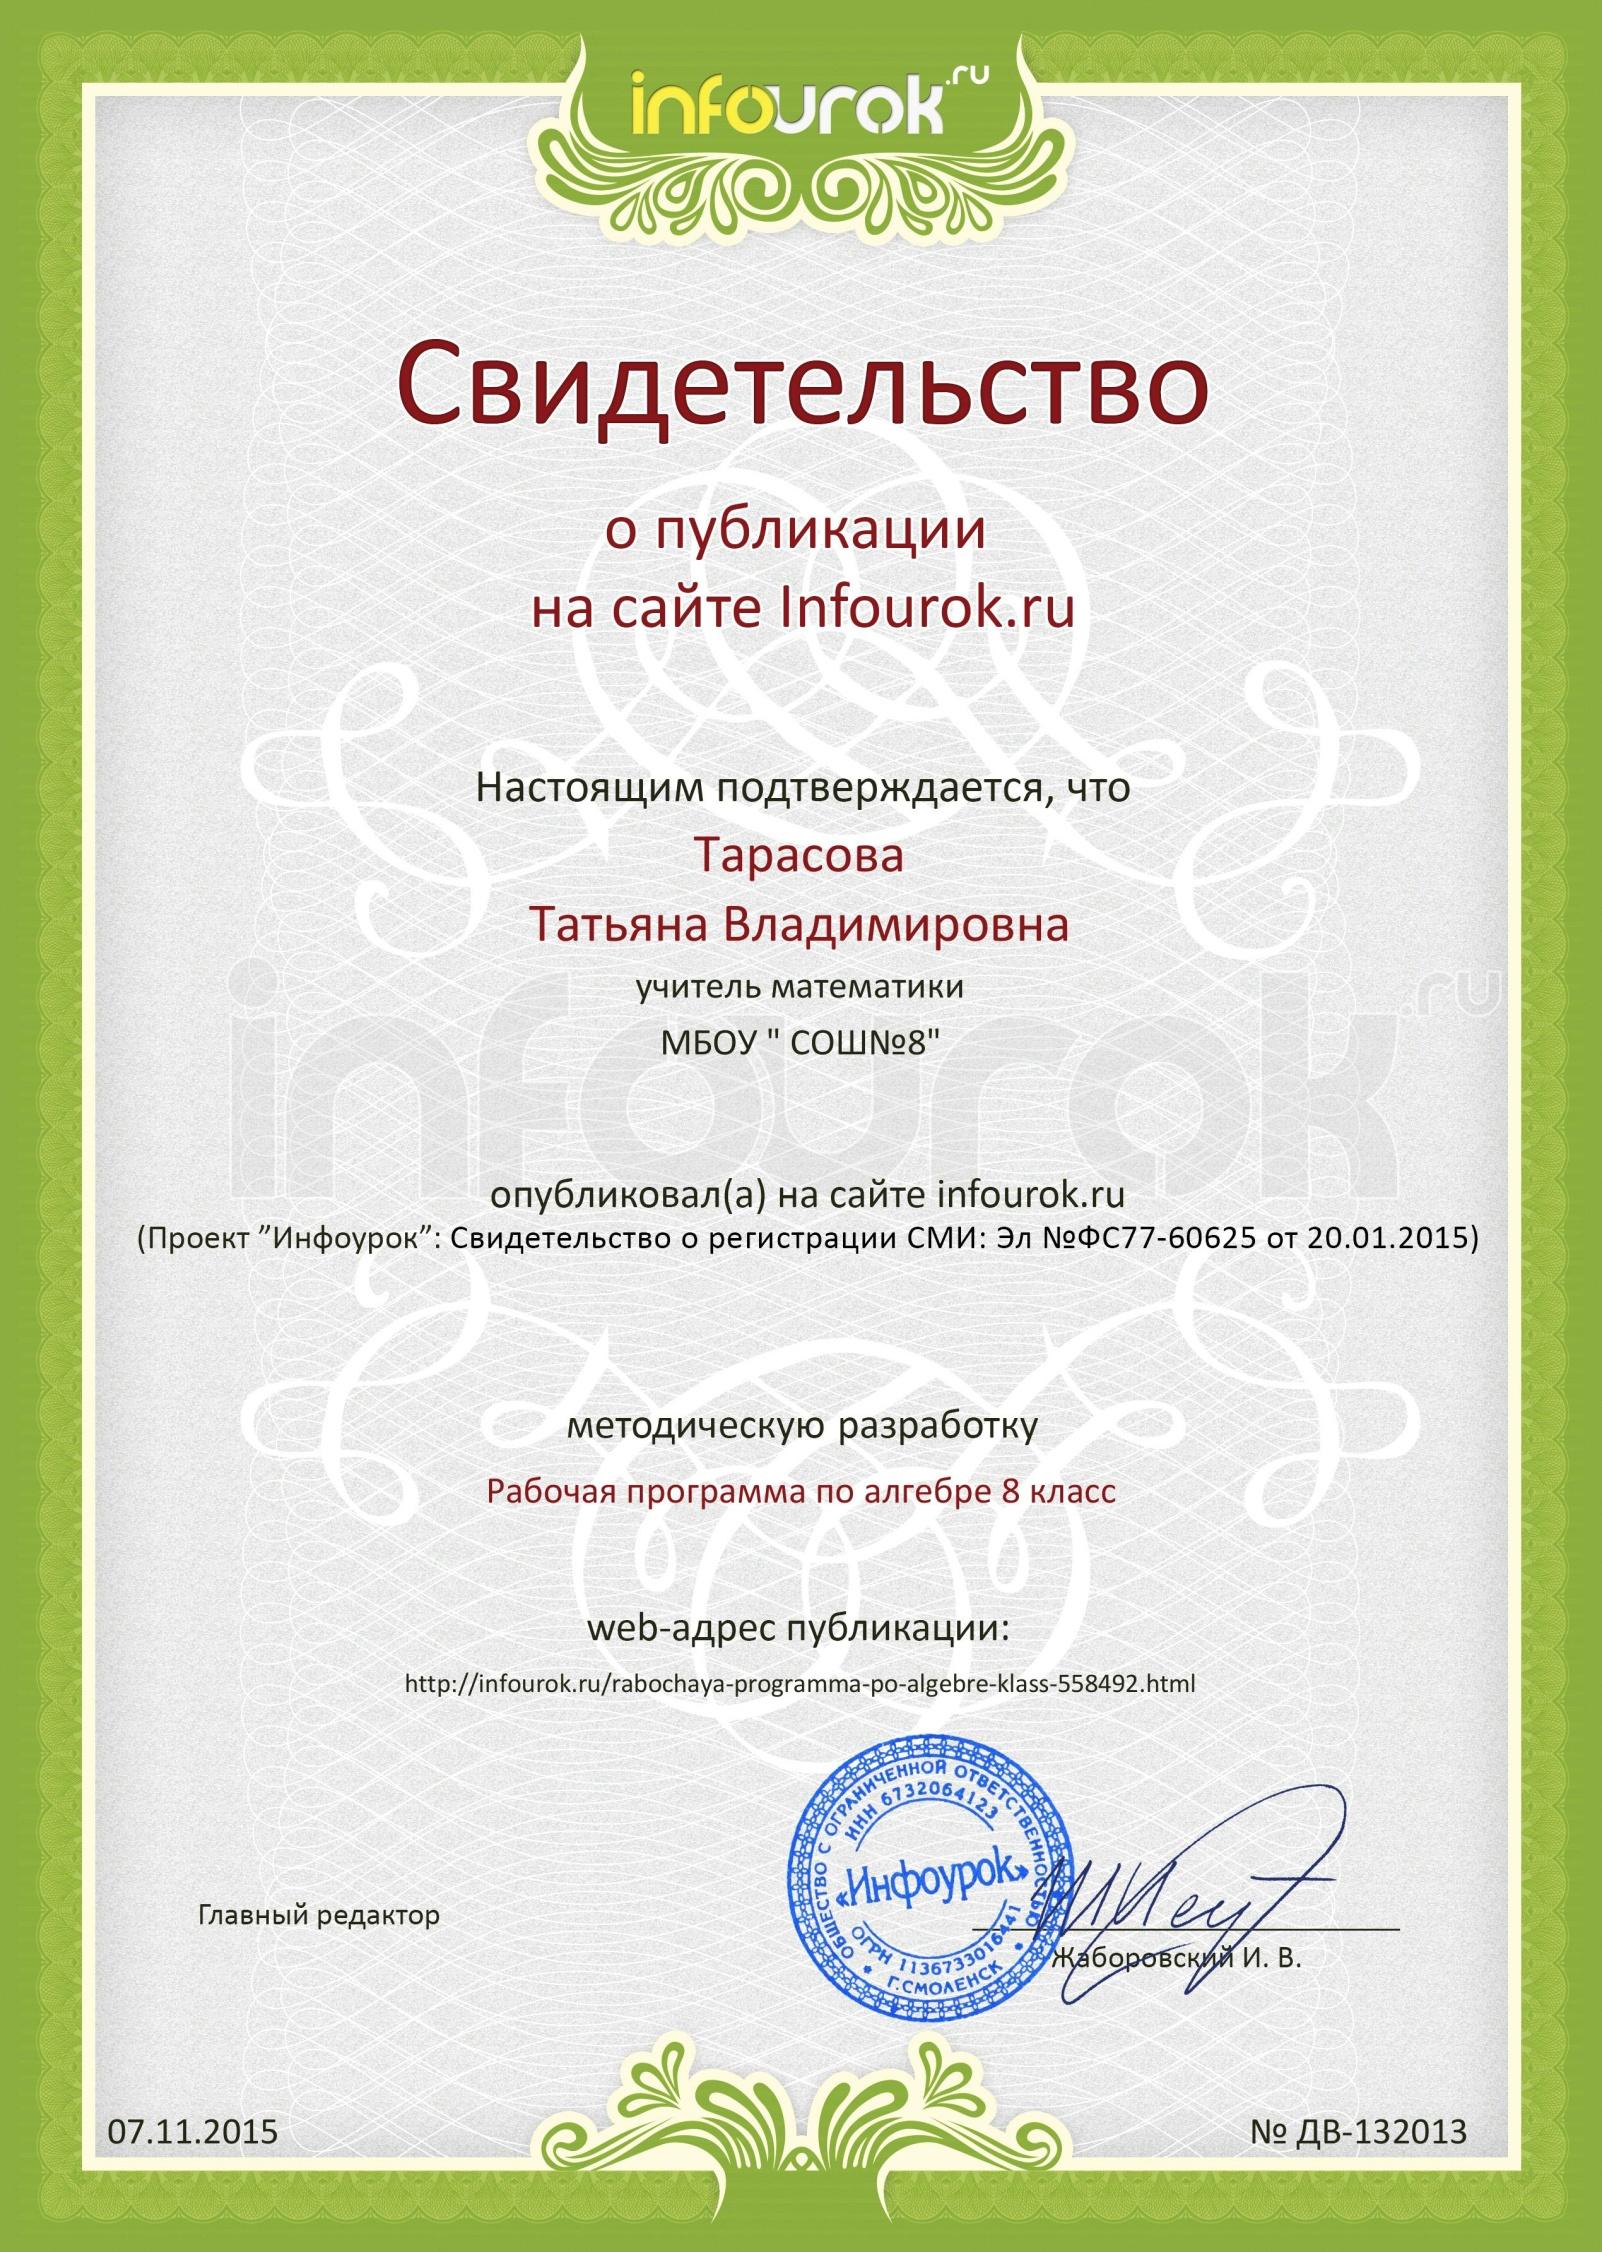 C:\Users\User\Downloads\Сертификат проекта infourok.ru № ДВ-132013.jpg